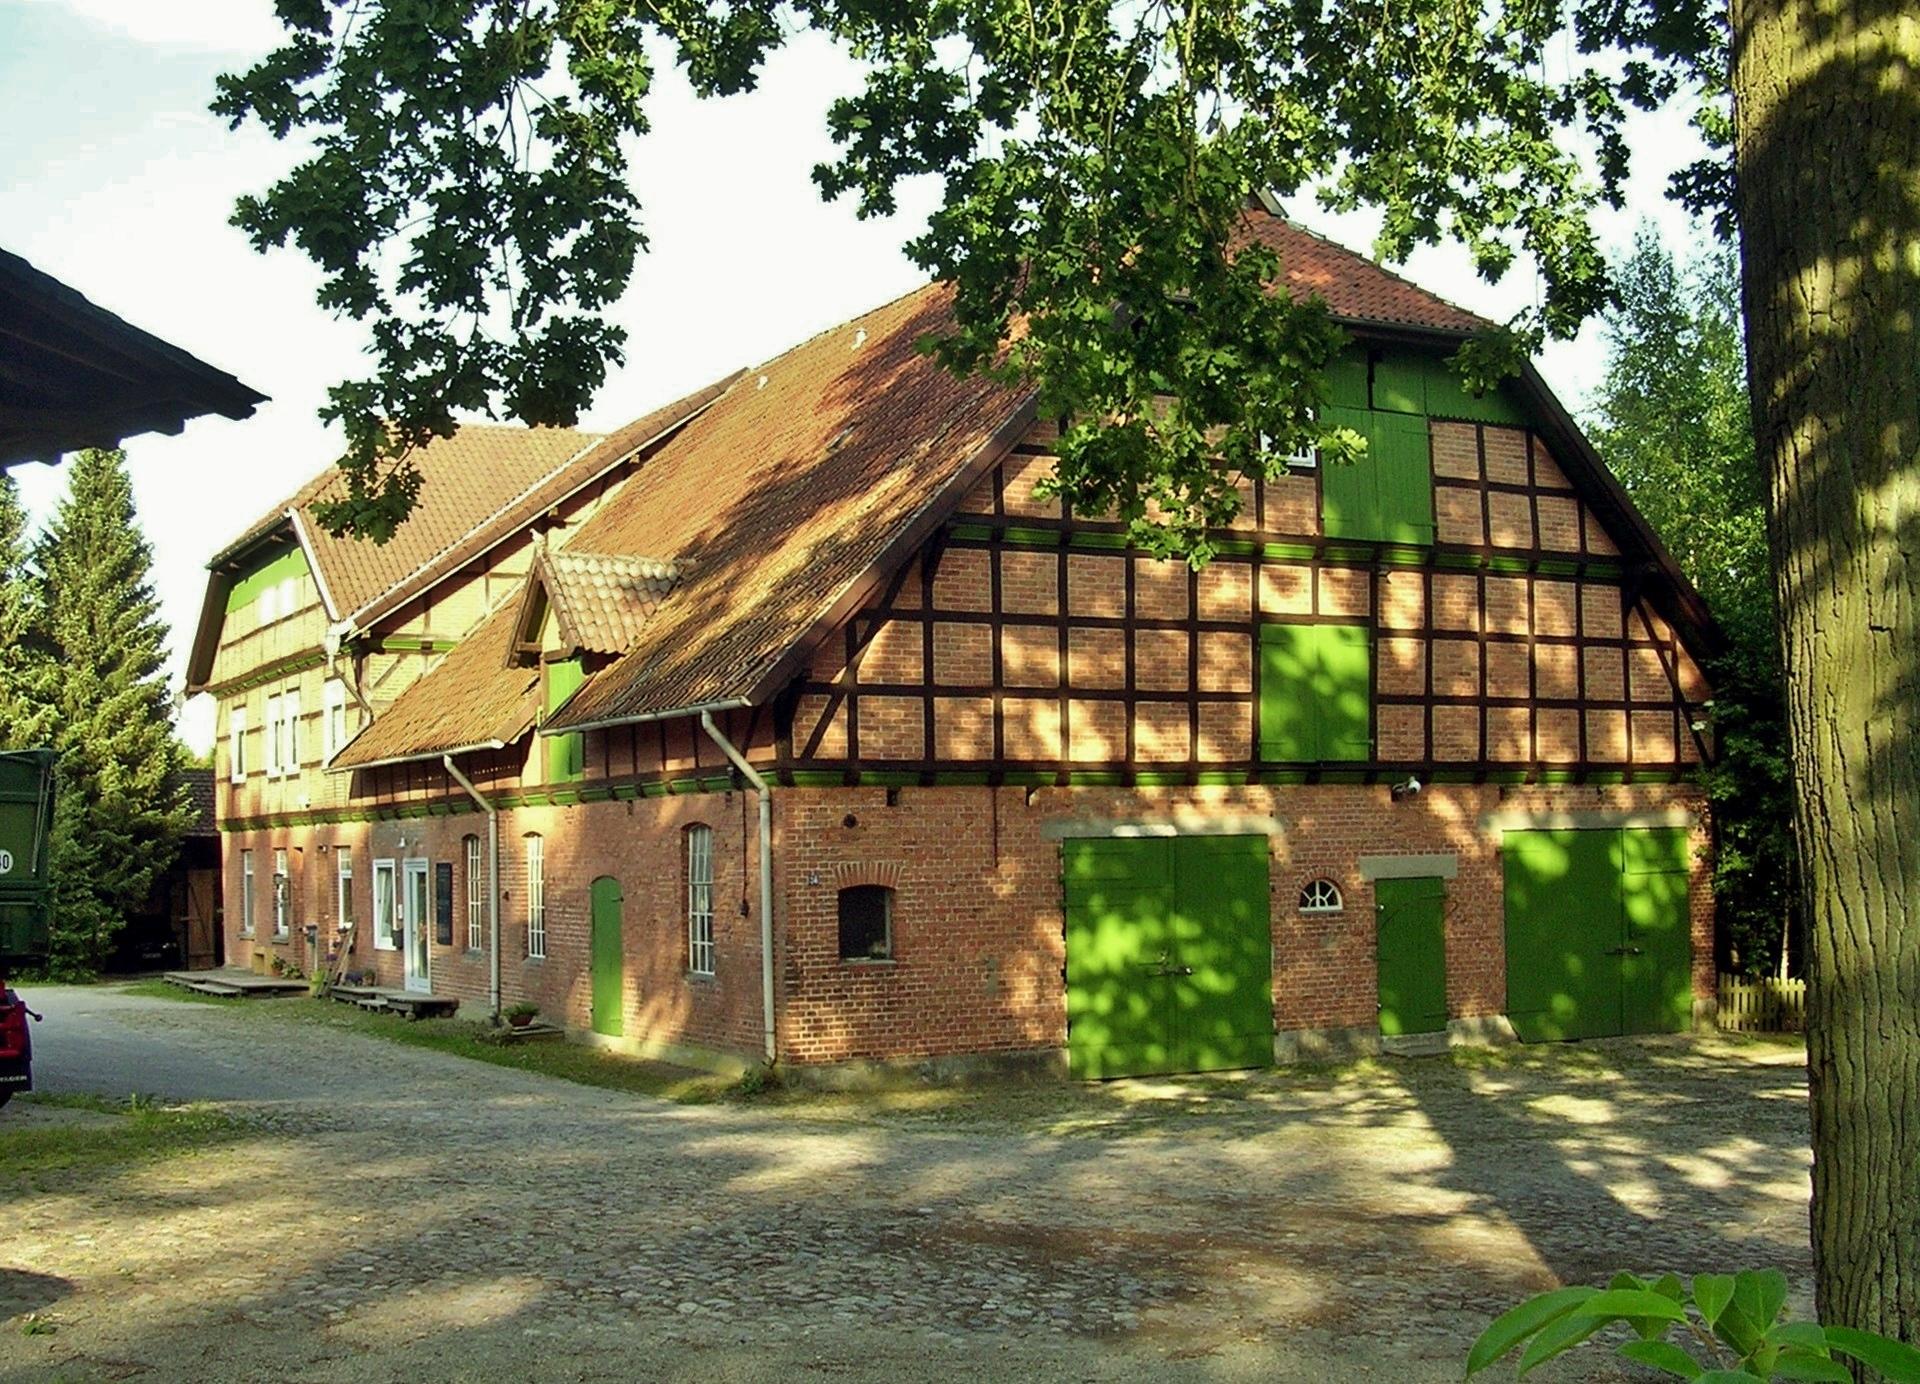 h-steinhorst-gf-1925